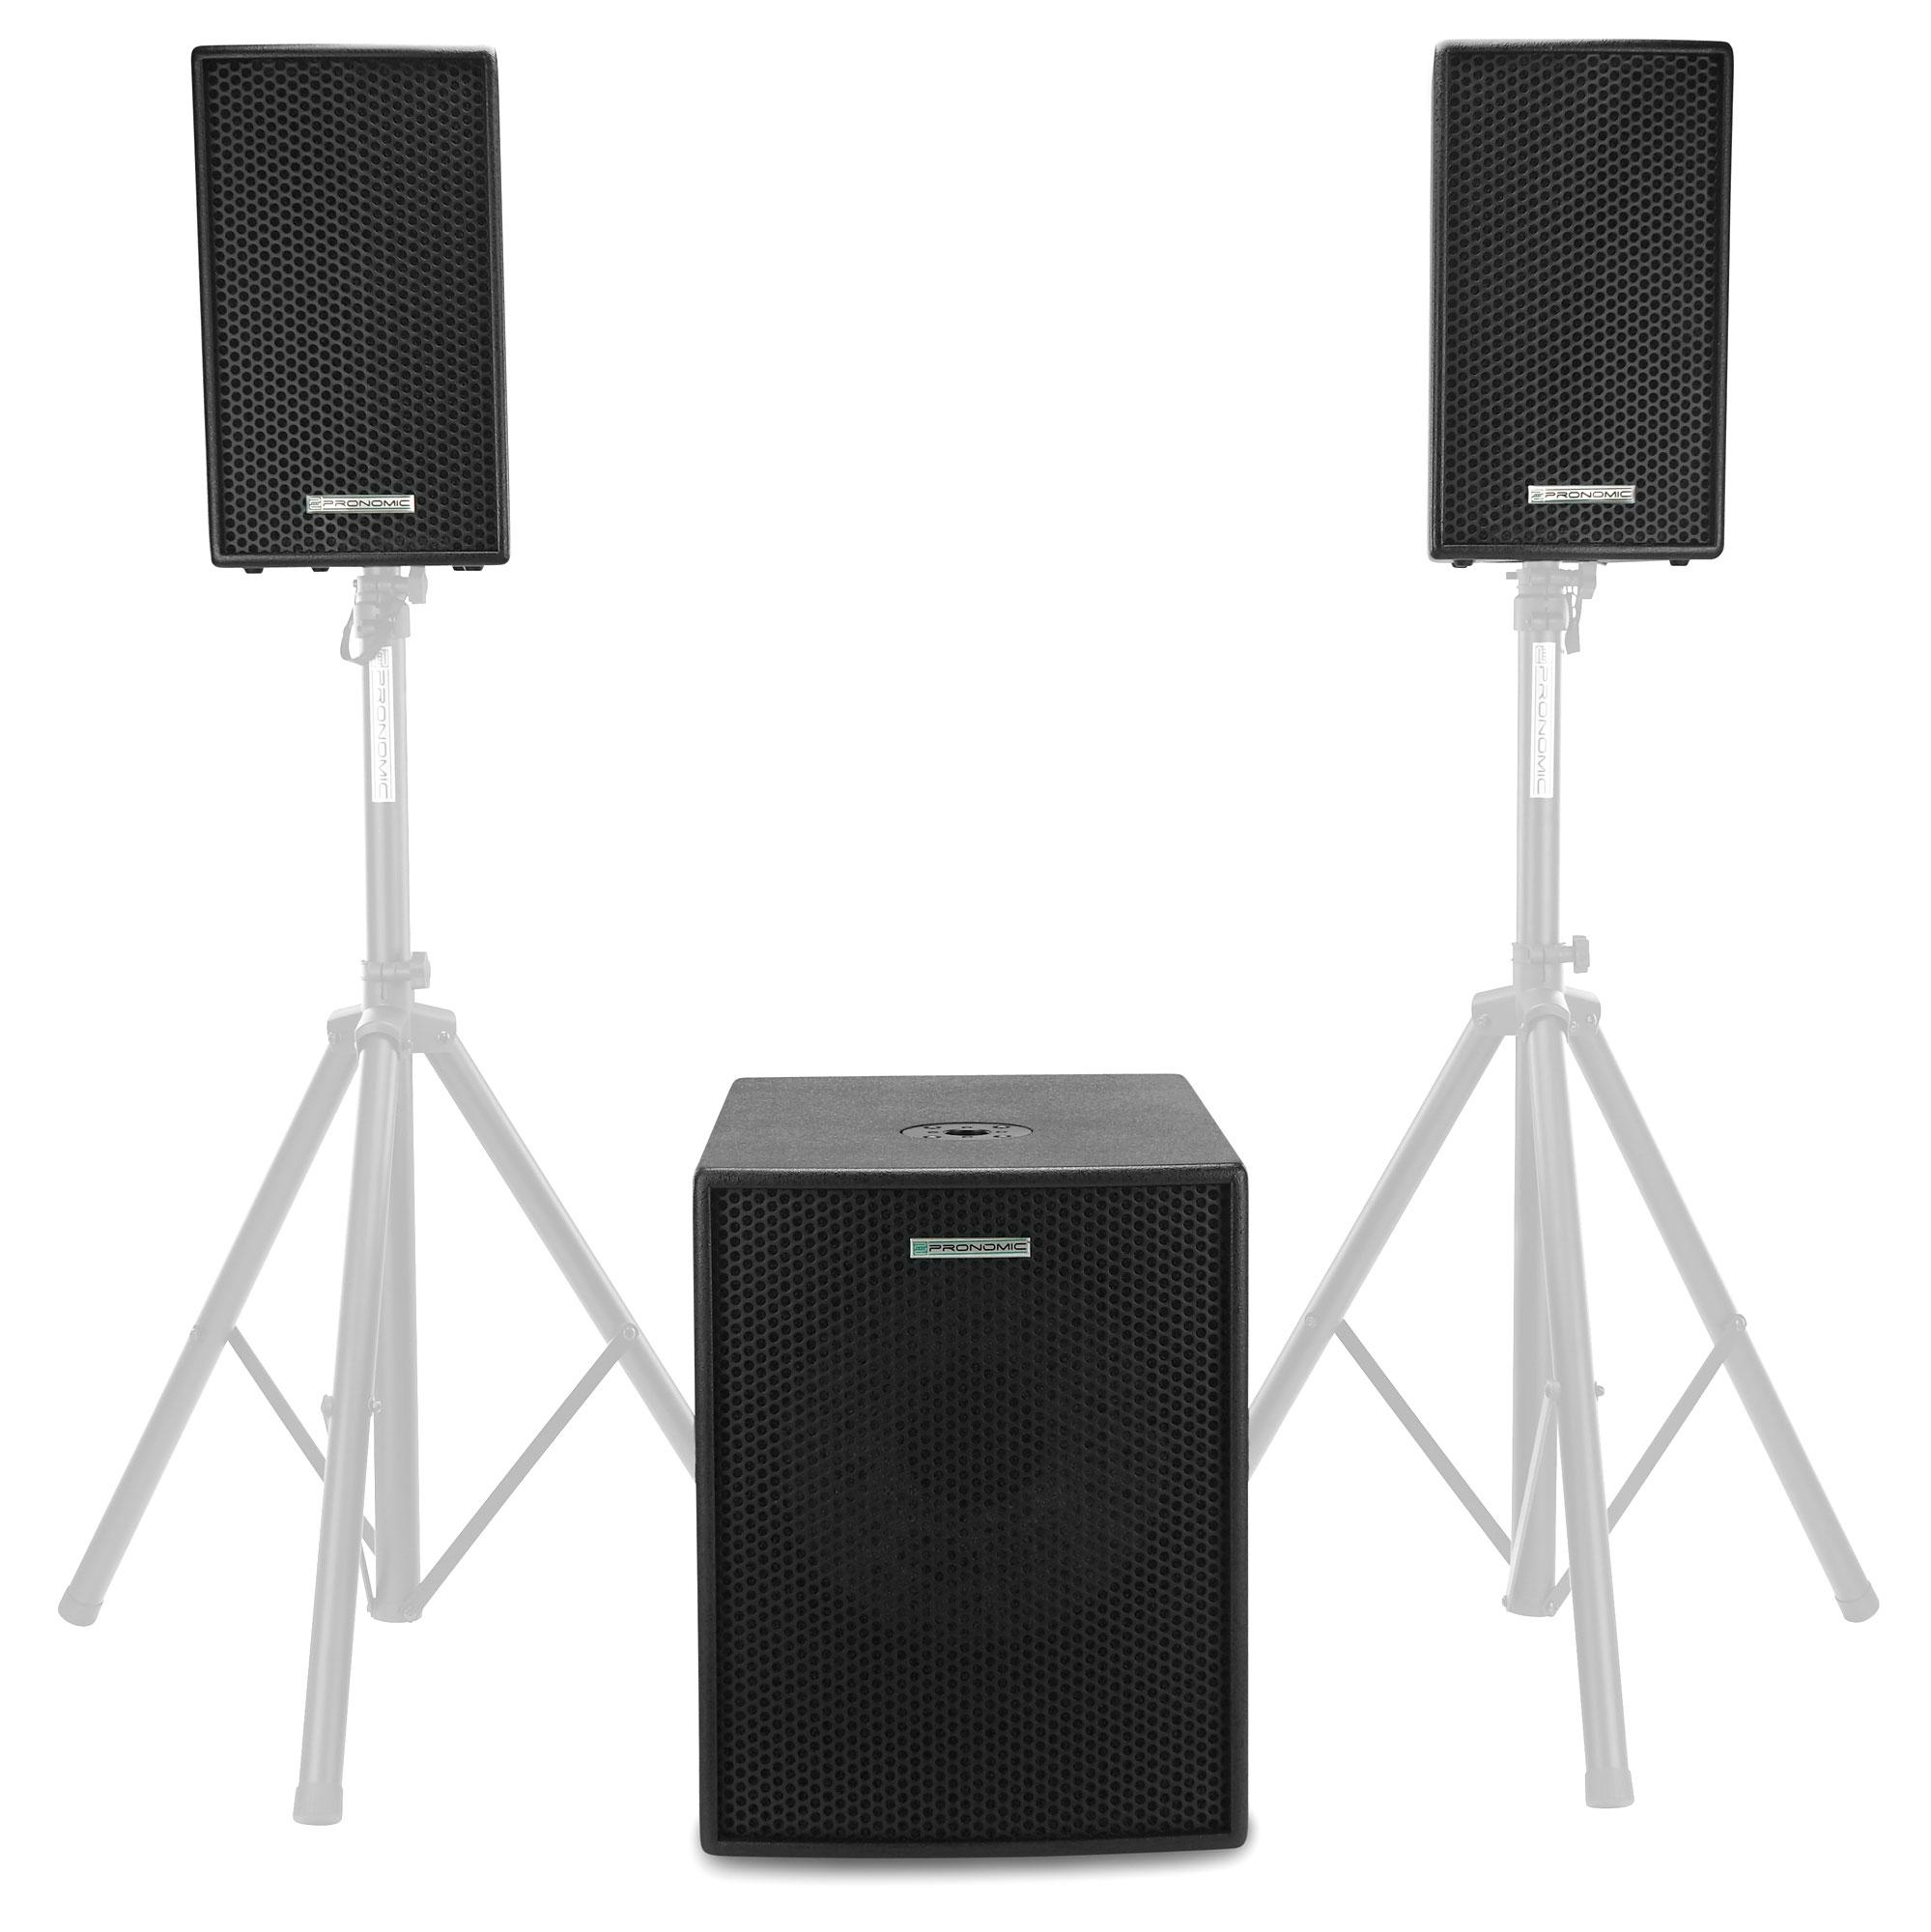 Pronomic XL 5D PA Aktiv System 600 Watt